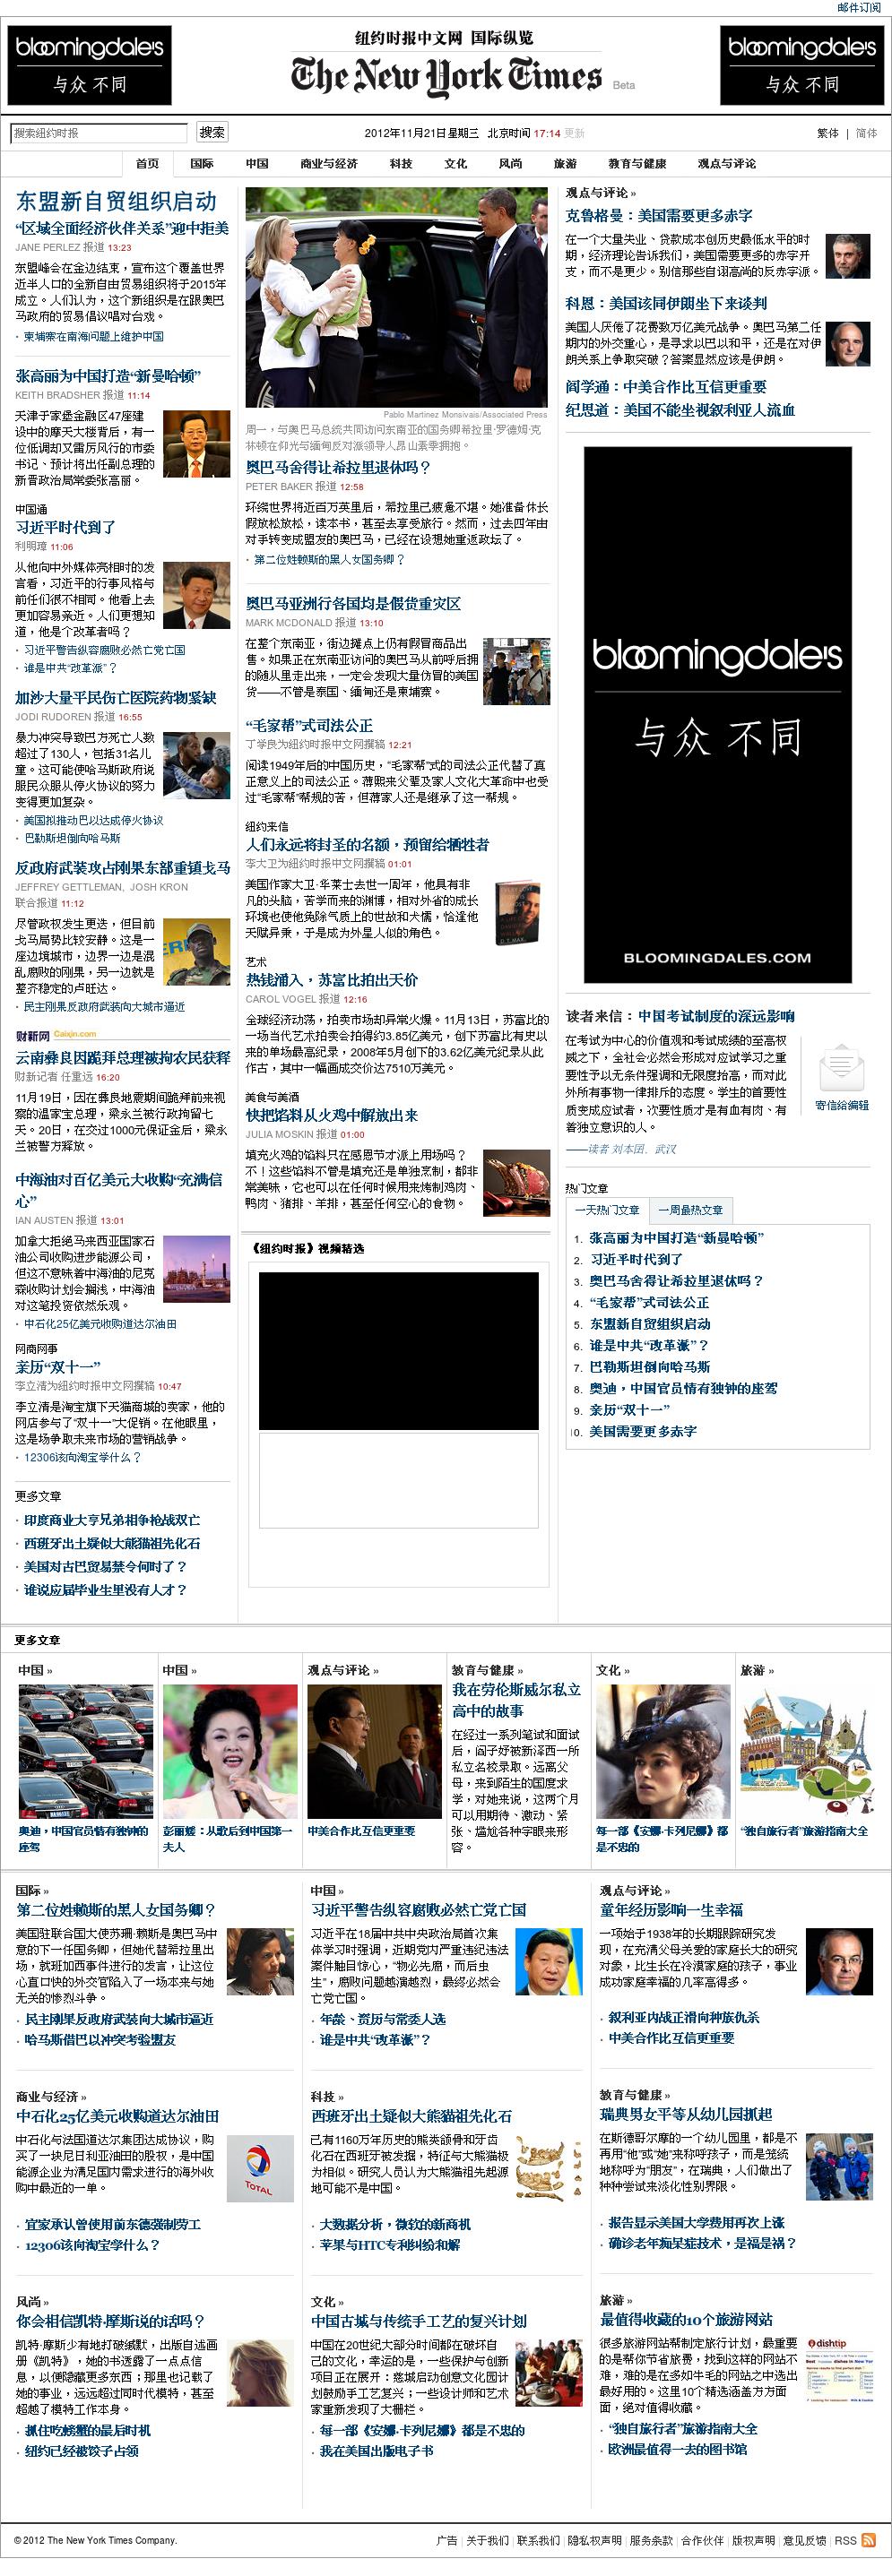 The New York Times (Chinese) at Wednesday Nov. 21, 2012, 10:19 p.m. UTC